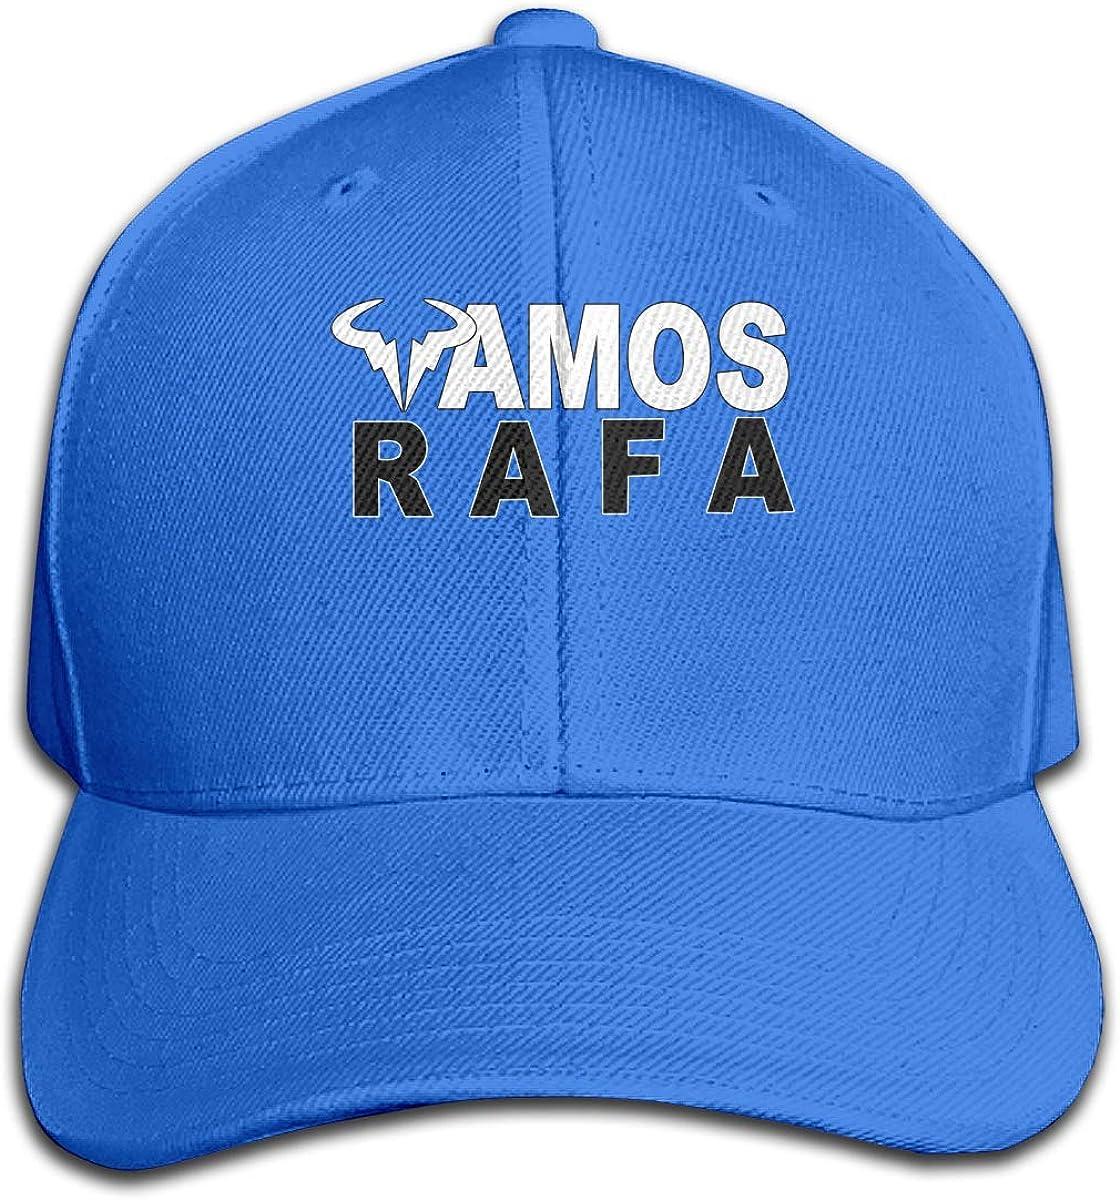 David A Beltran Rafa-Vamos-Rafael-Nadal Gorra Pure Color Peaked Sombrero Premium Sandwich Deportes Ajustables